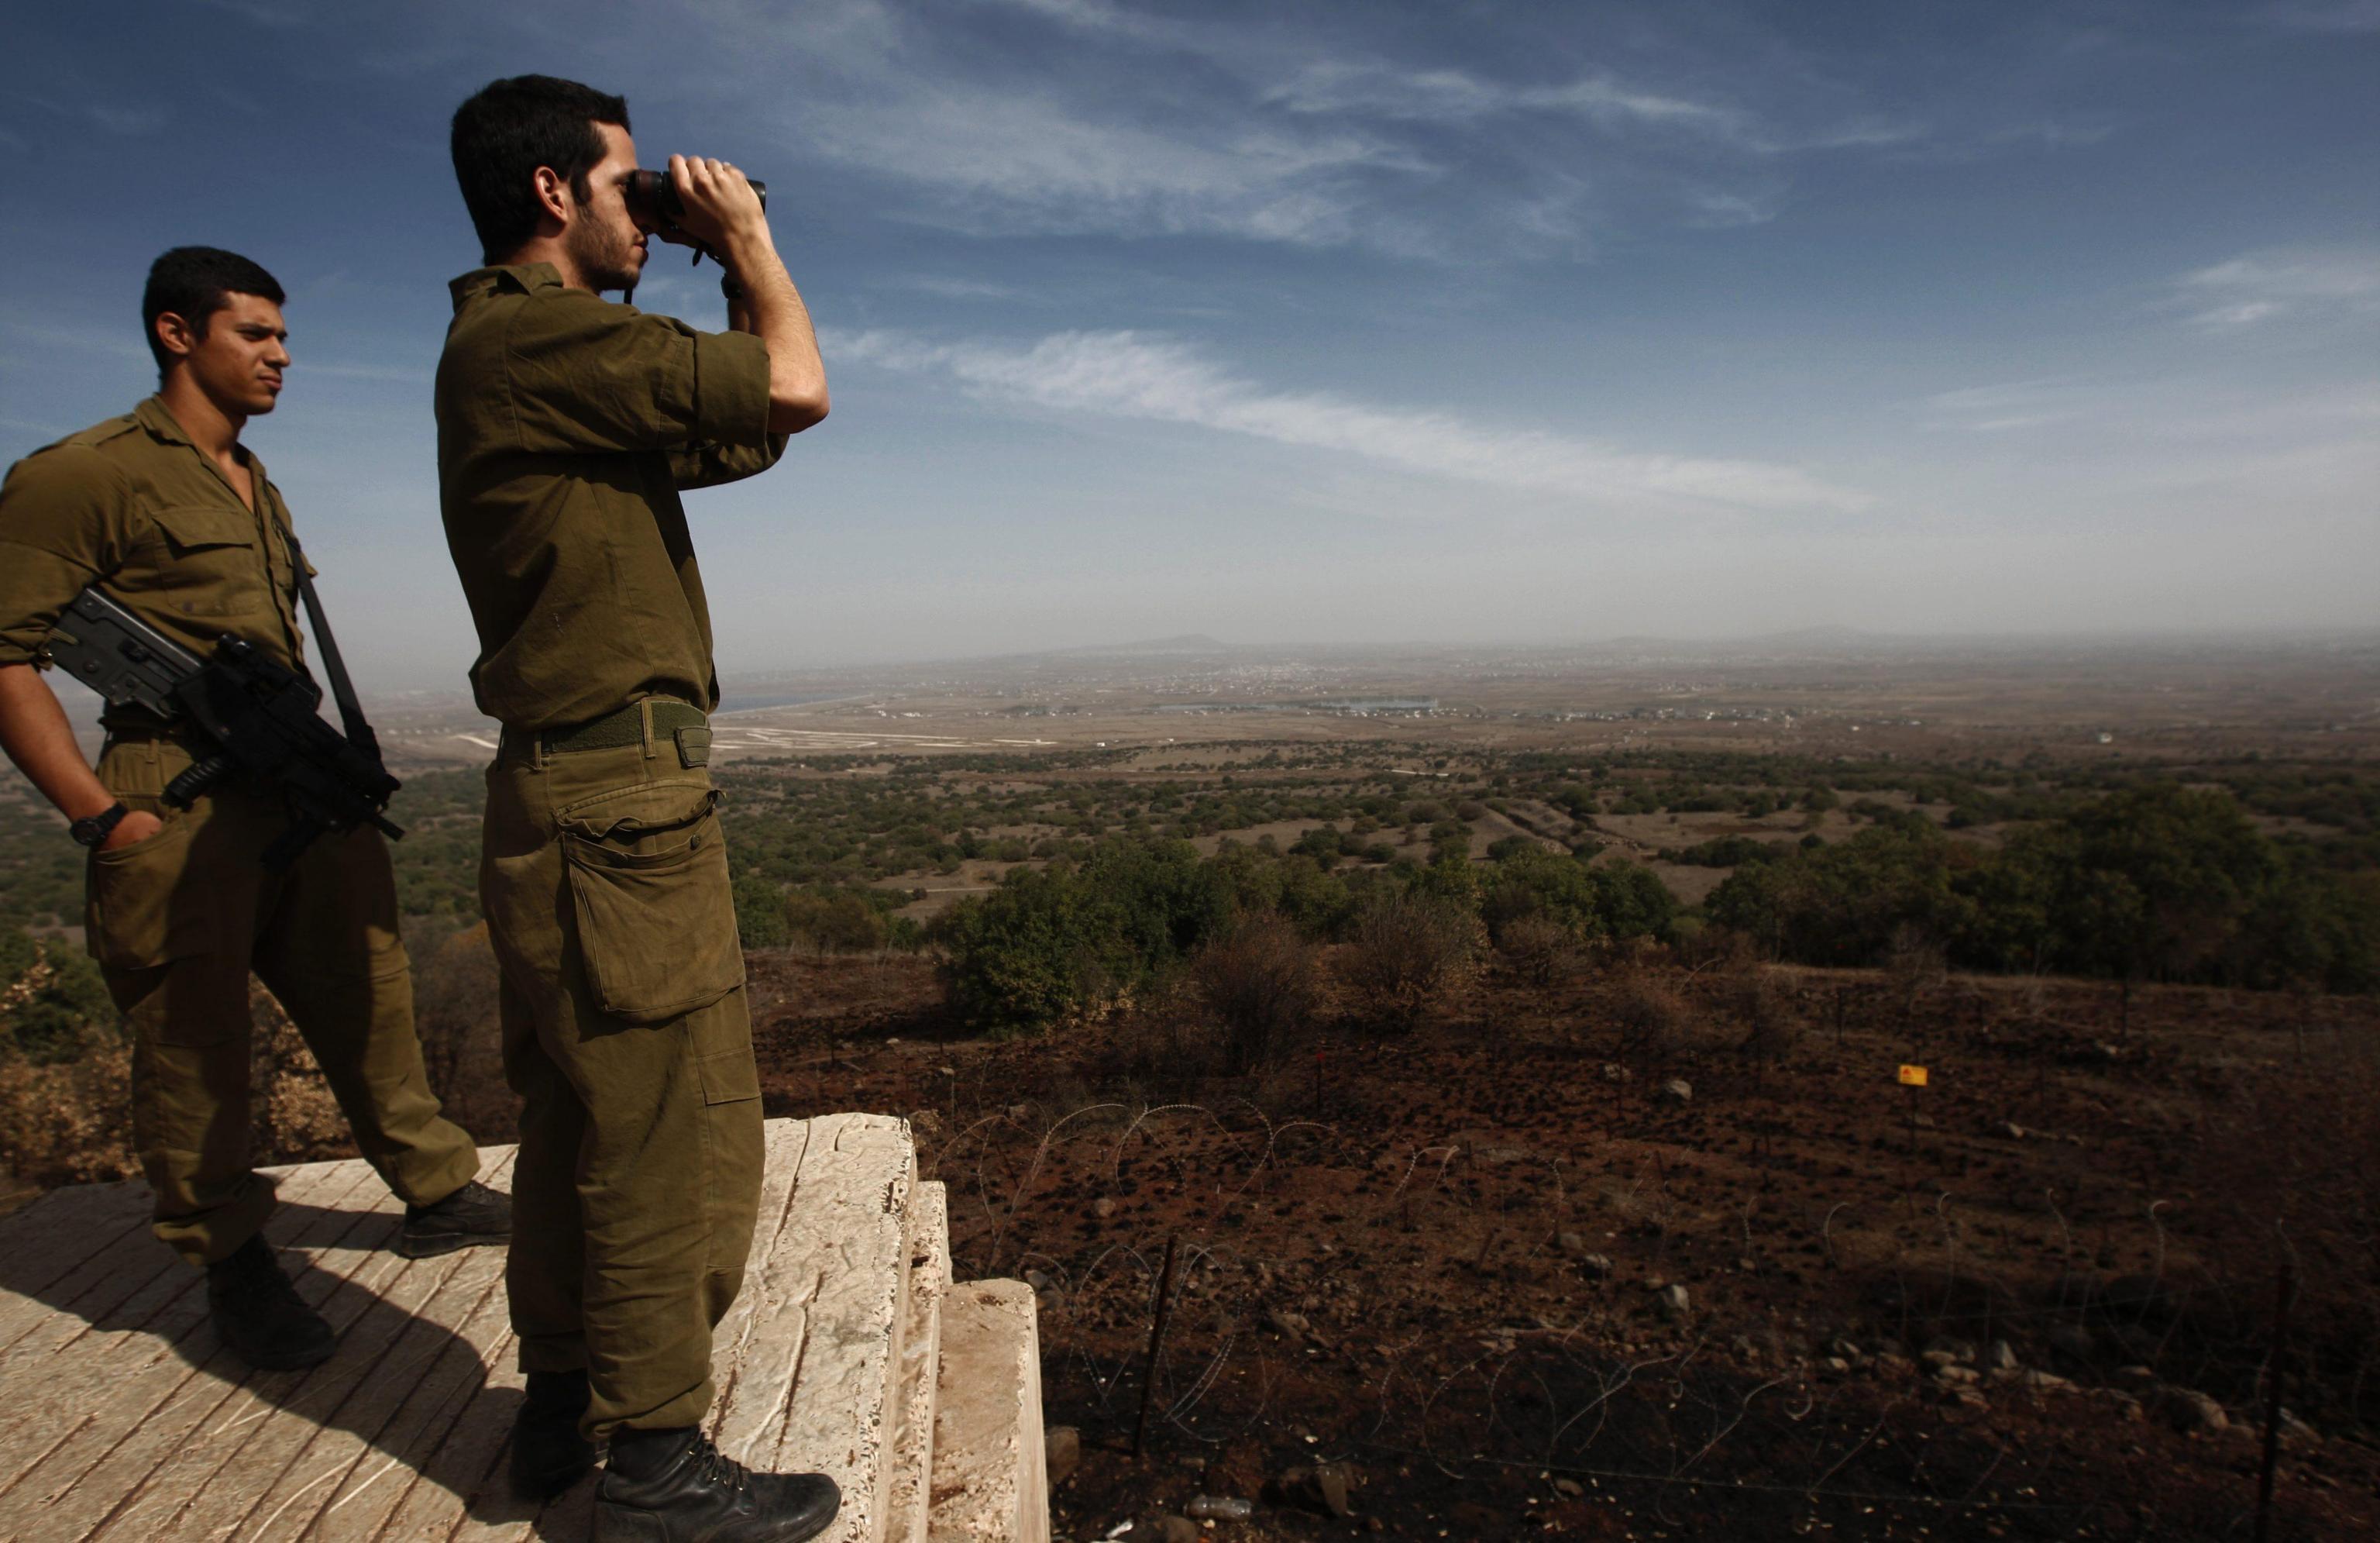 SIRIA:ACCORDO OPPOSIZIONI DOHA,PRIMI COLPI DA ISRAELE DAL '73